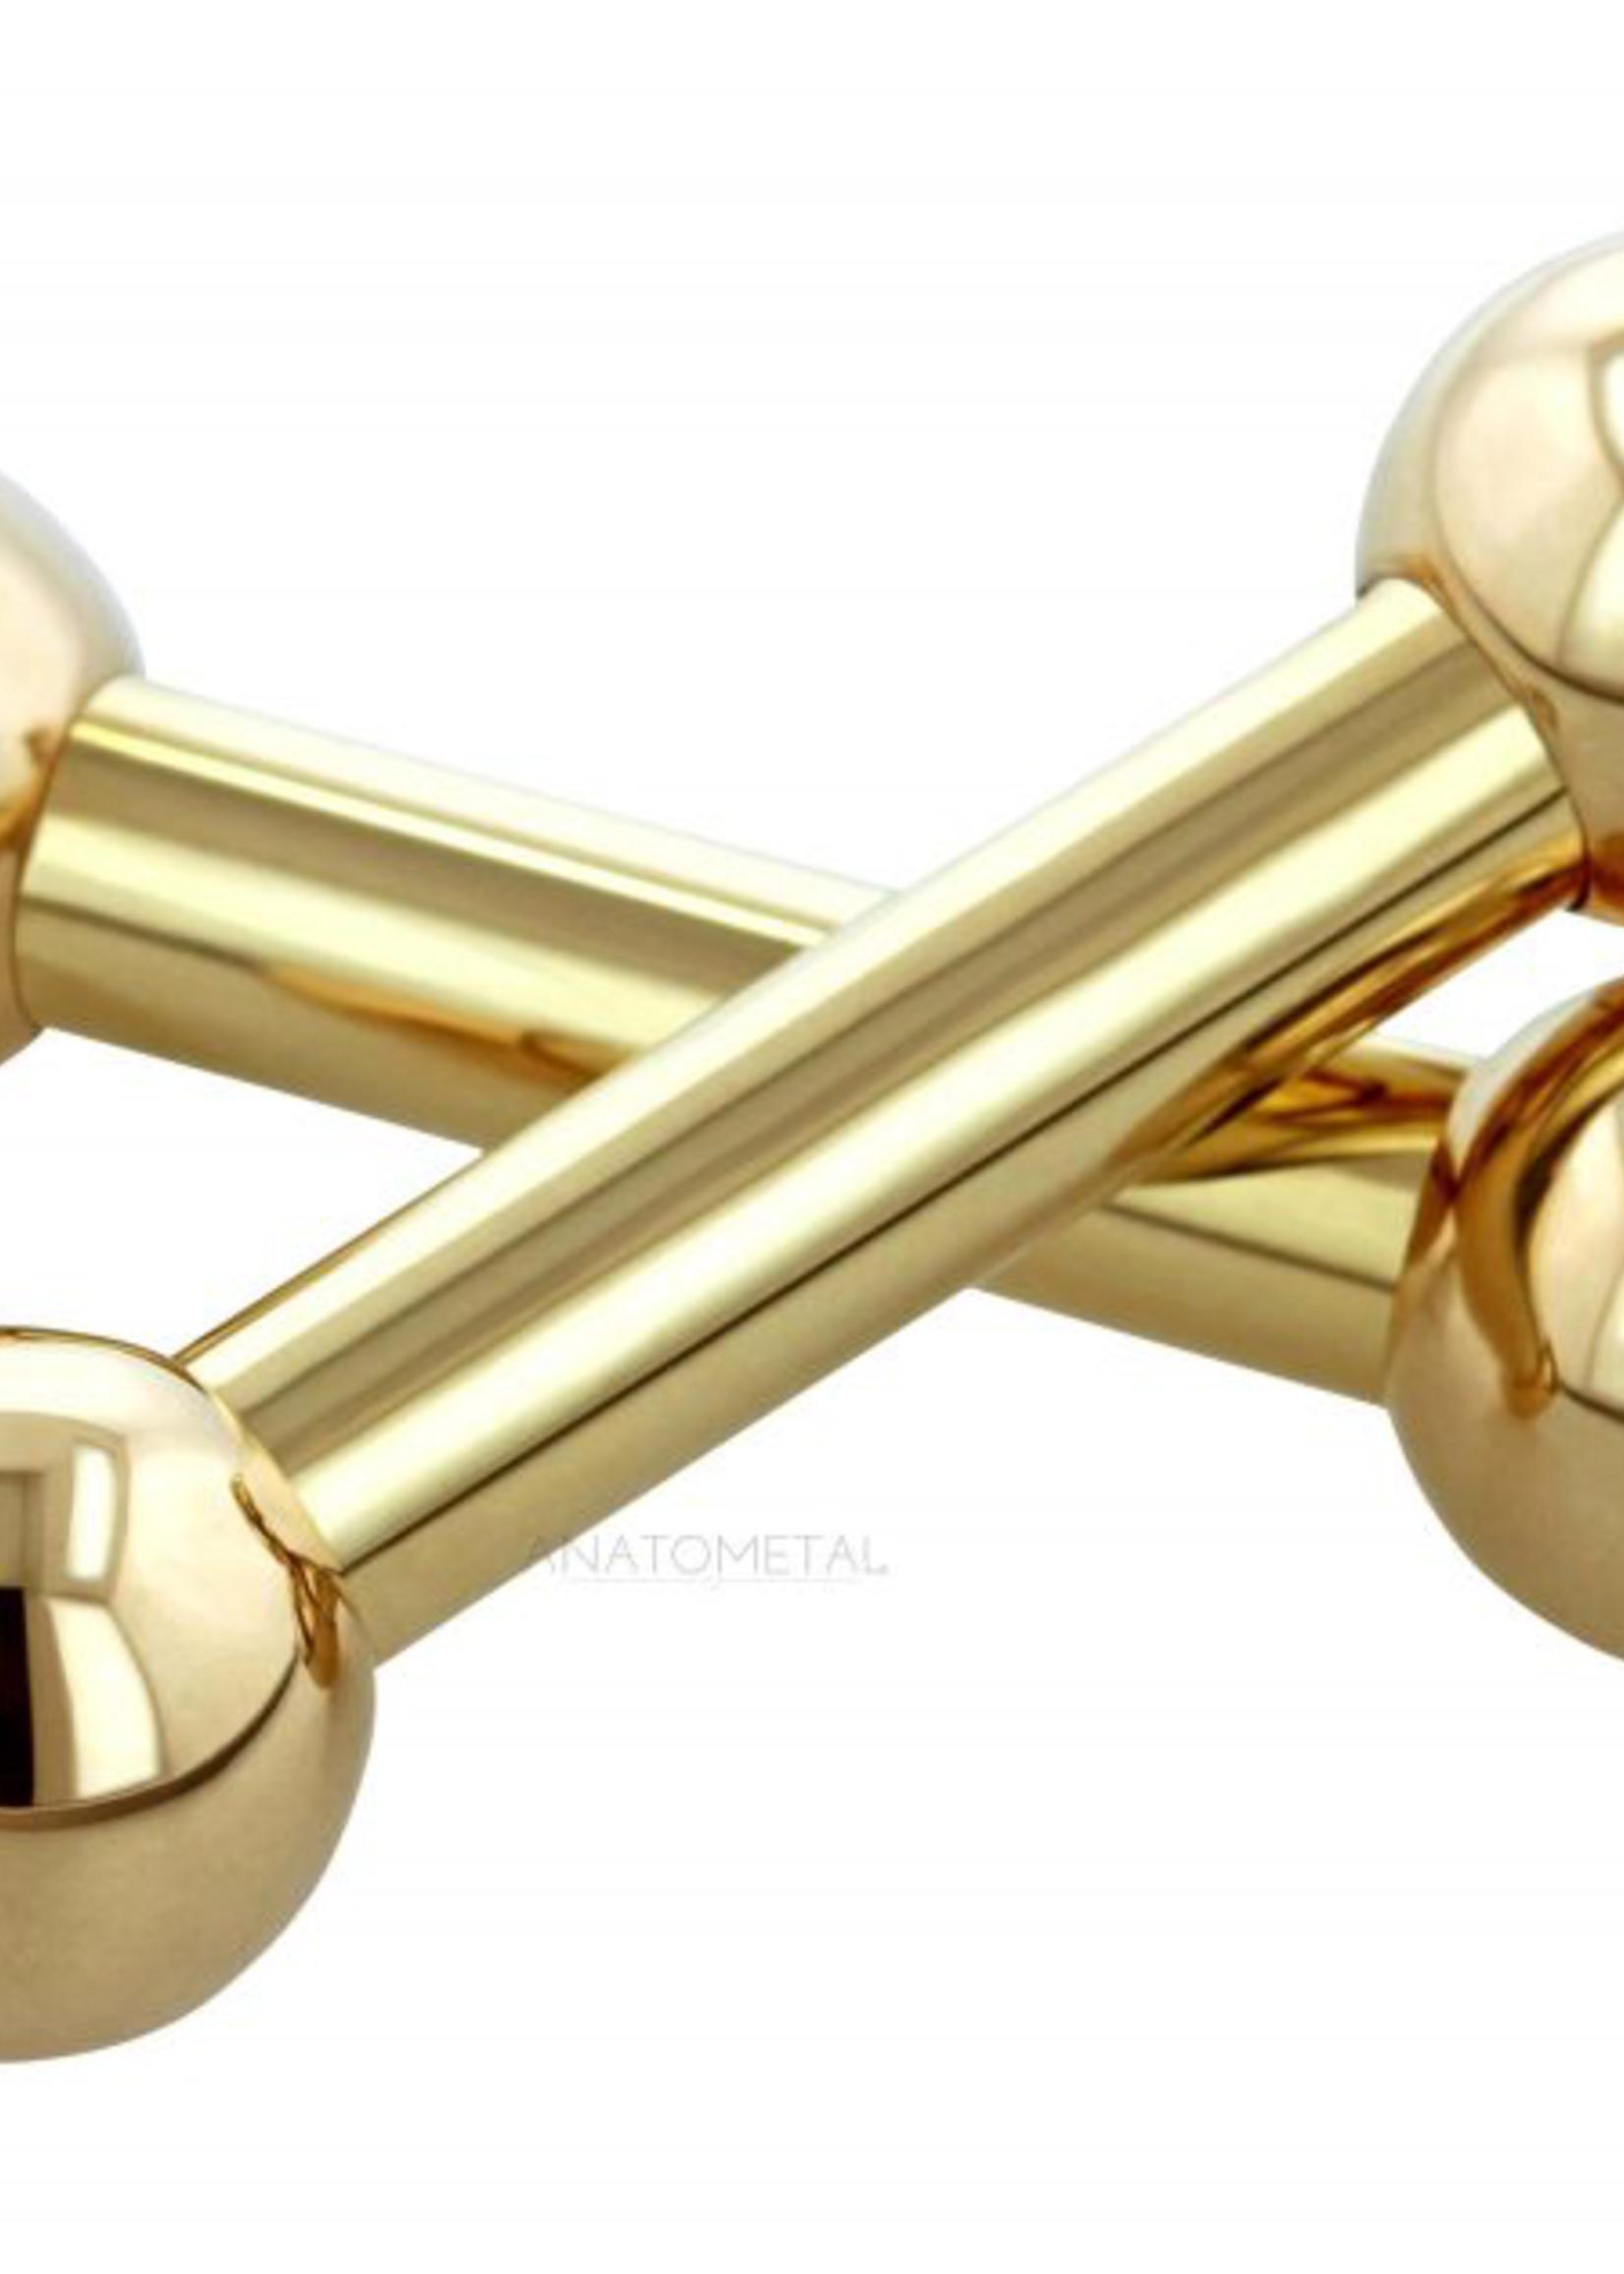 14g Titanium Internally Threaded Straight Barbell